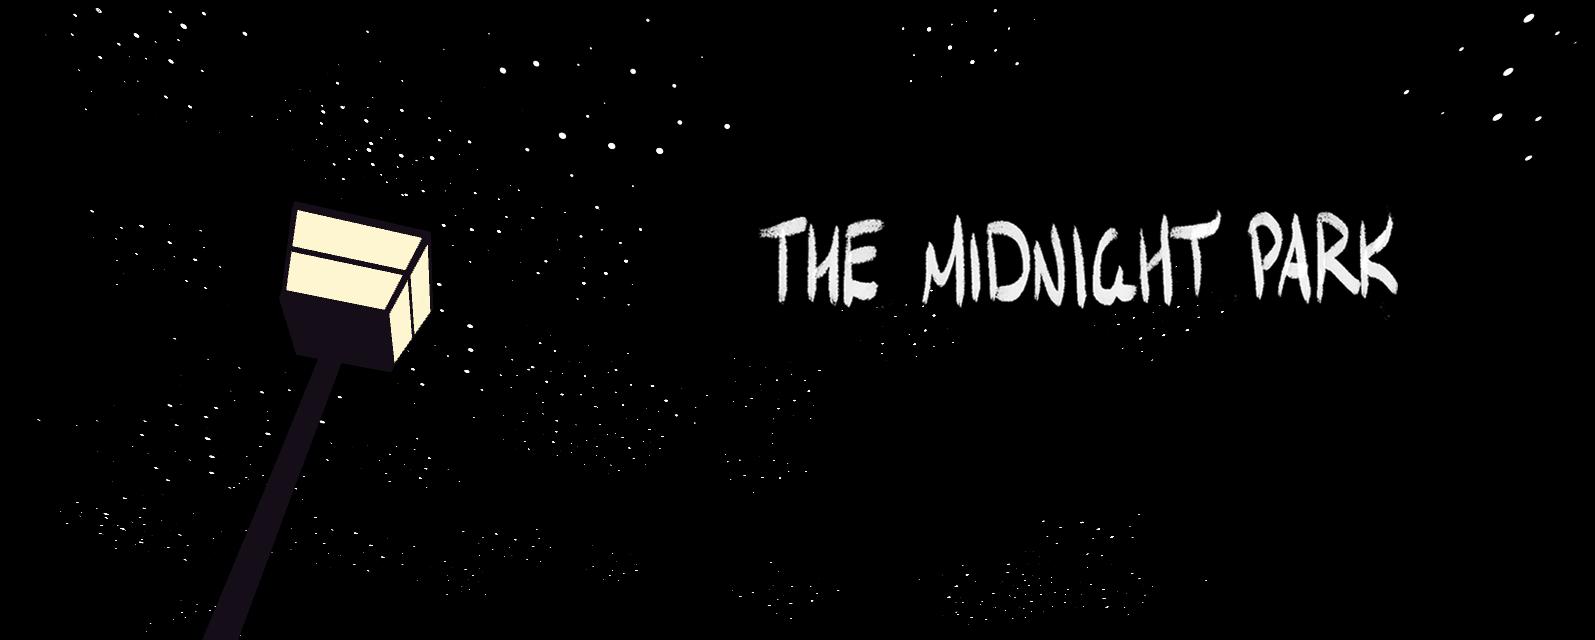 The Midnight Park